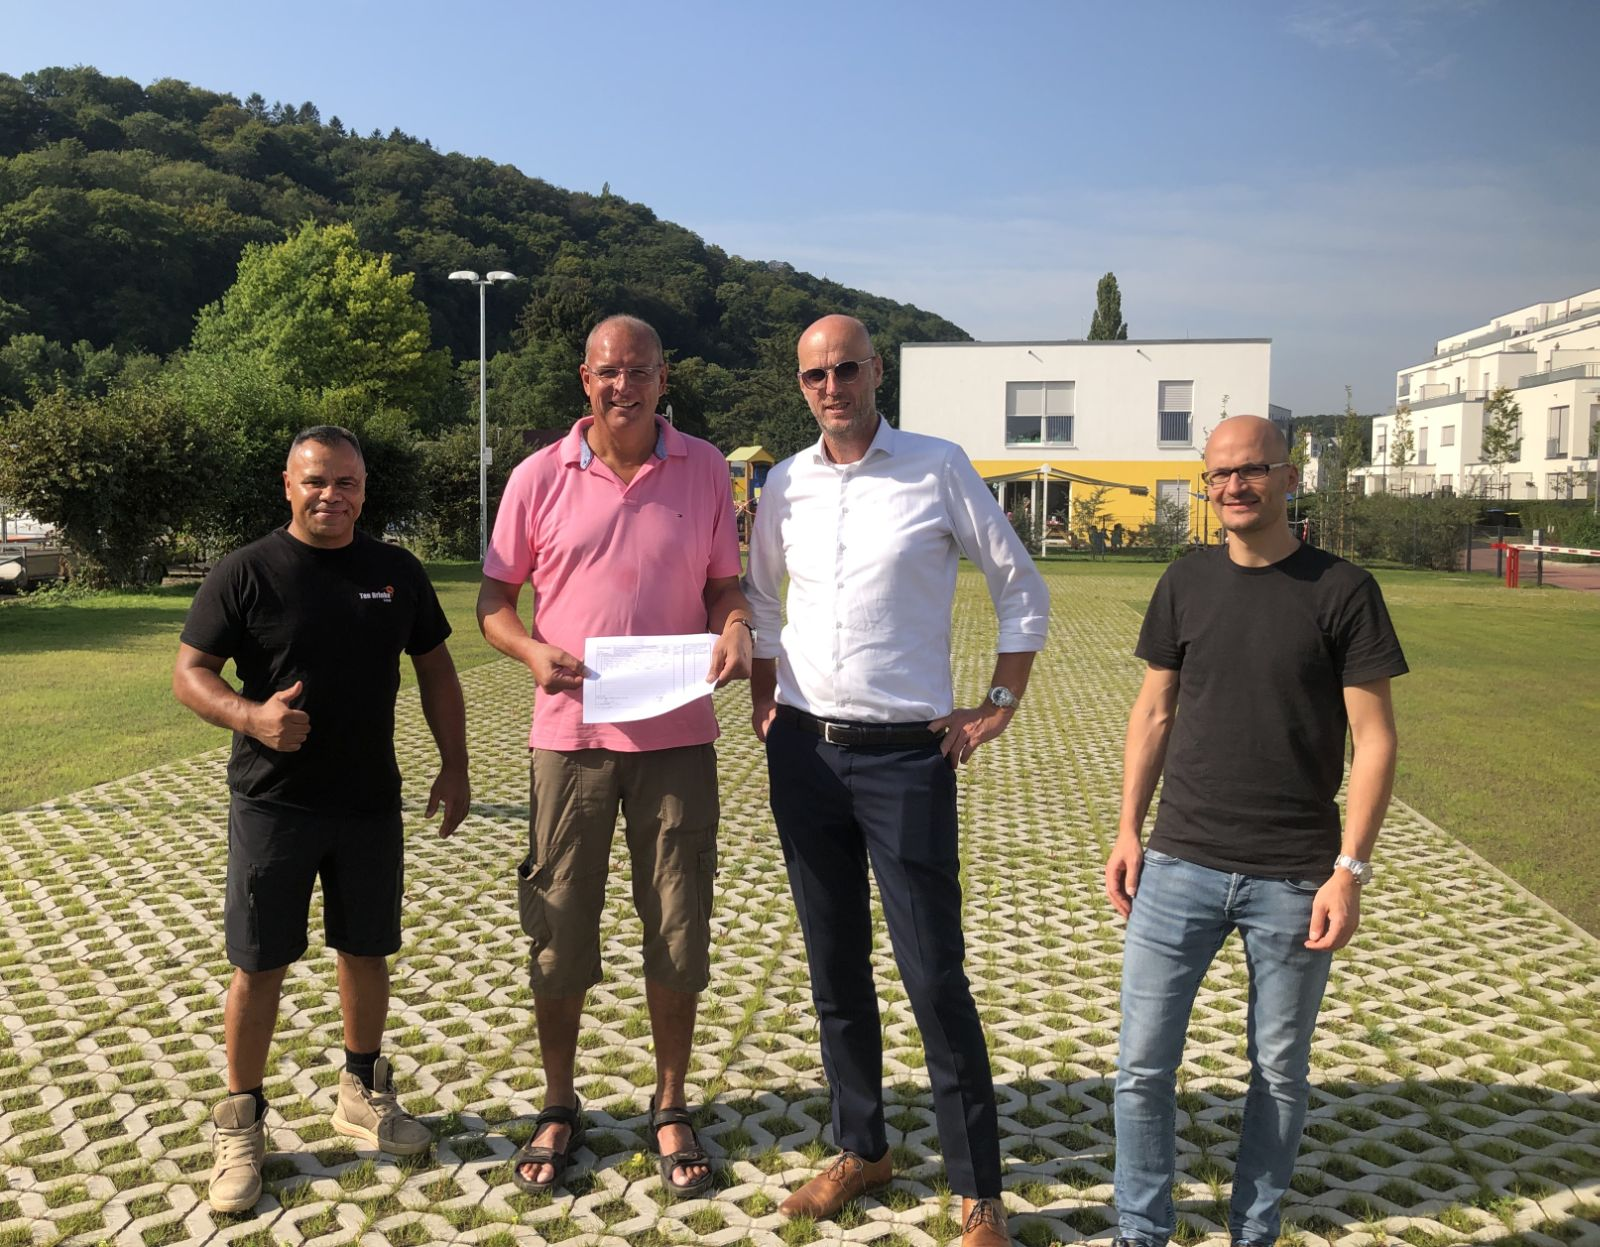 Richard Letsoin (Polier TenBrinke), Boris Orlowski, Jan Renskers (Projektleiter TenBrinke), Joel Jerrentrup (Fa. Monheimius)